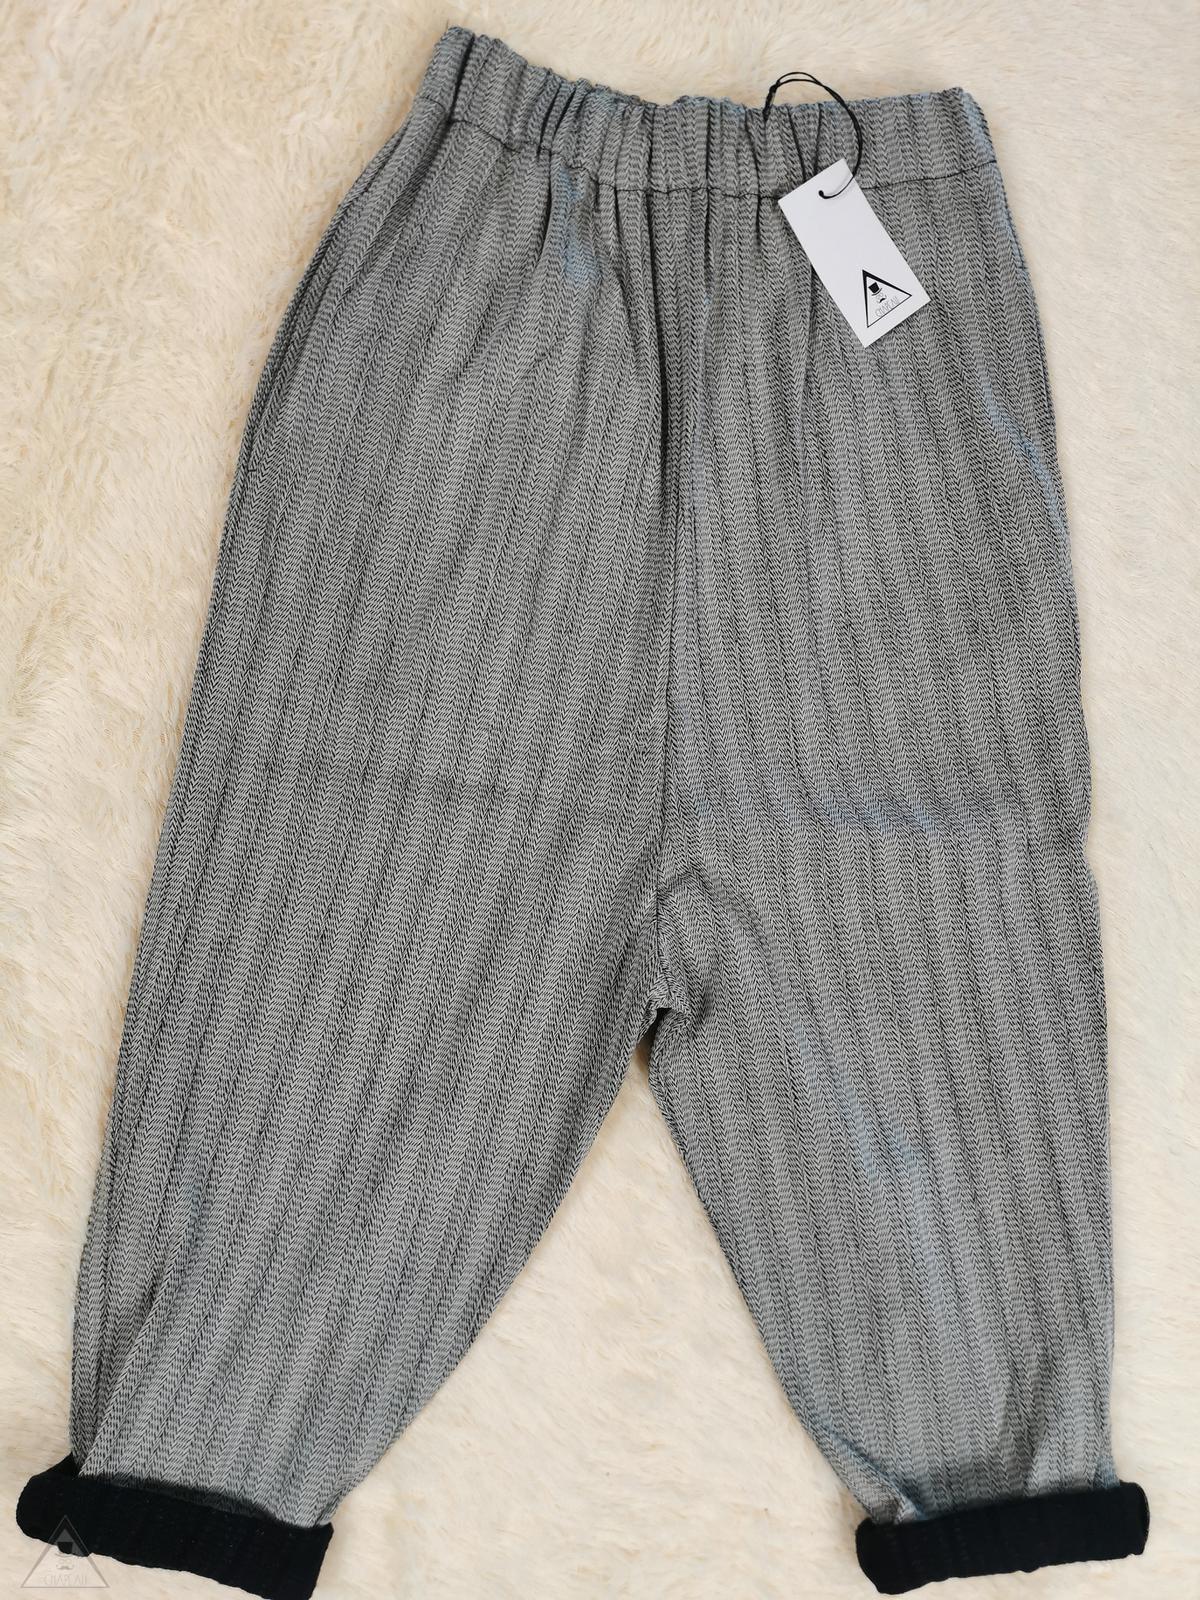 Pantalone cavallo basso Spiga